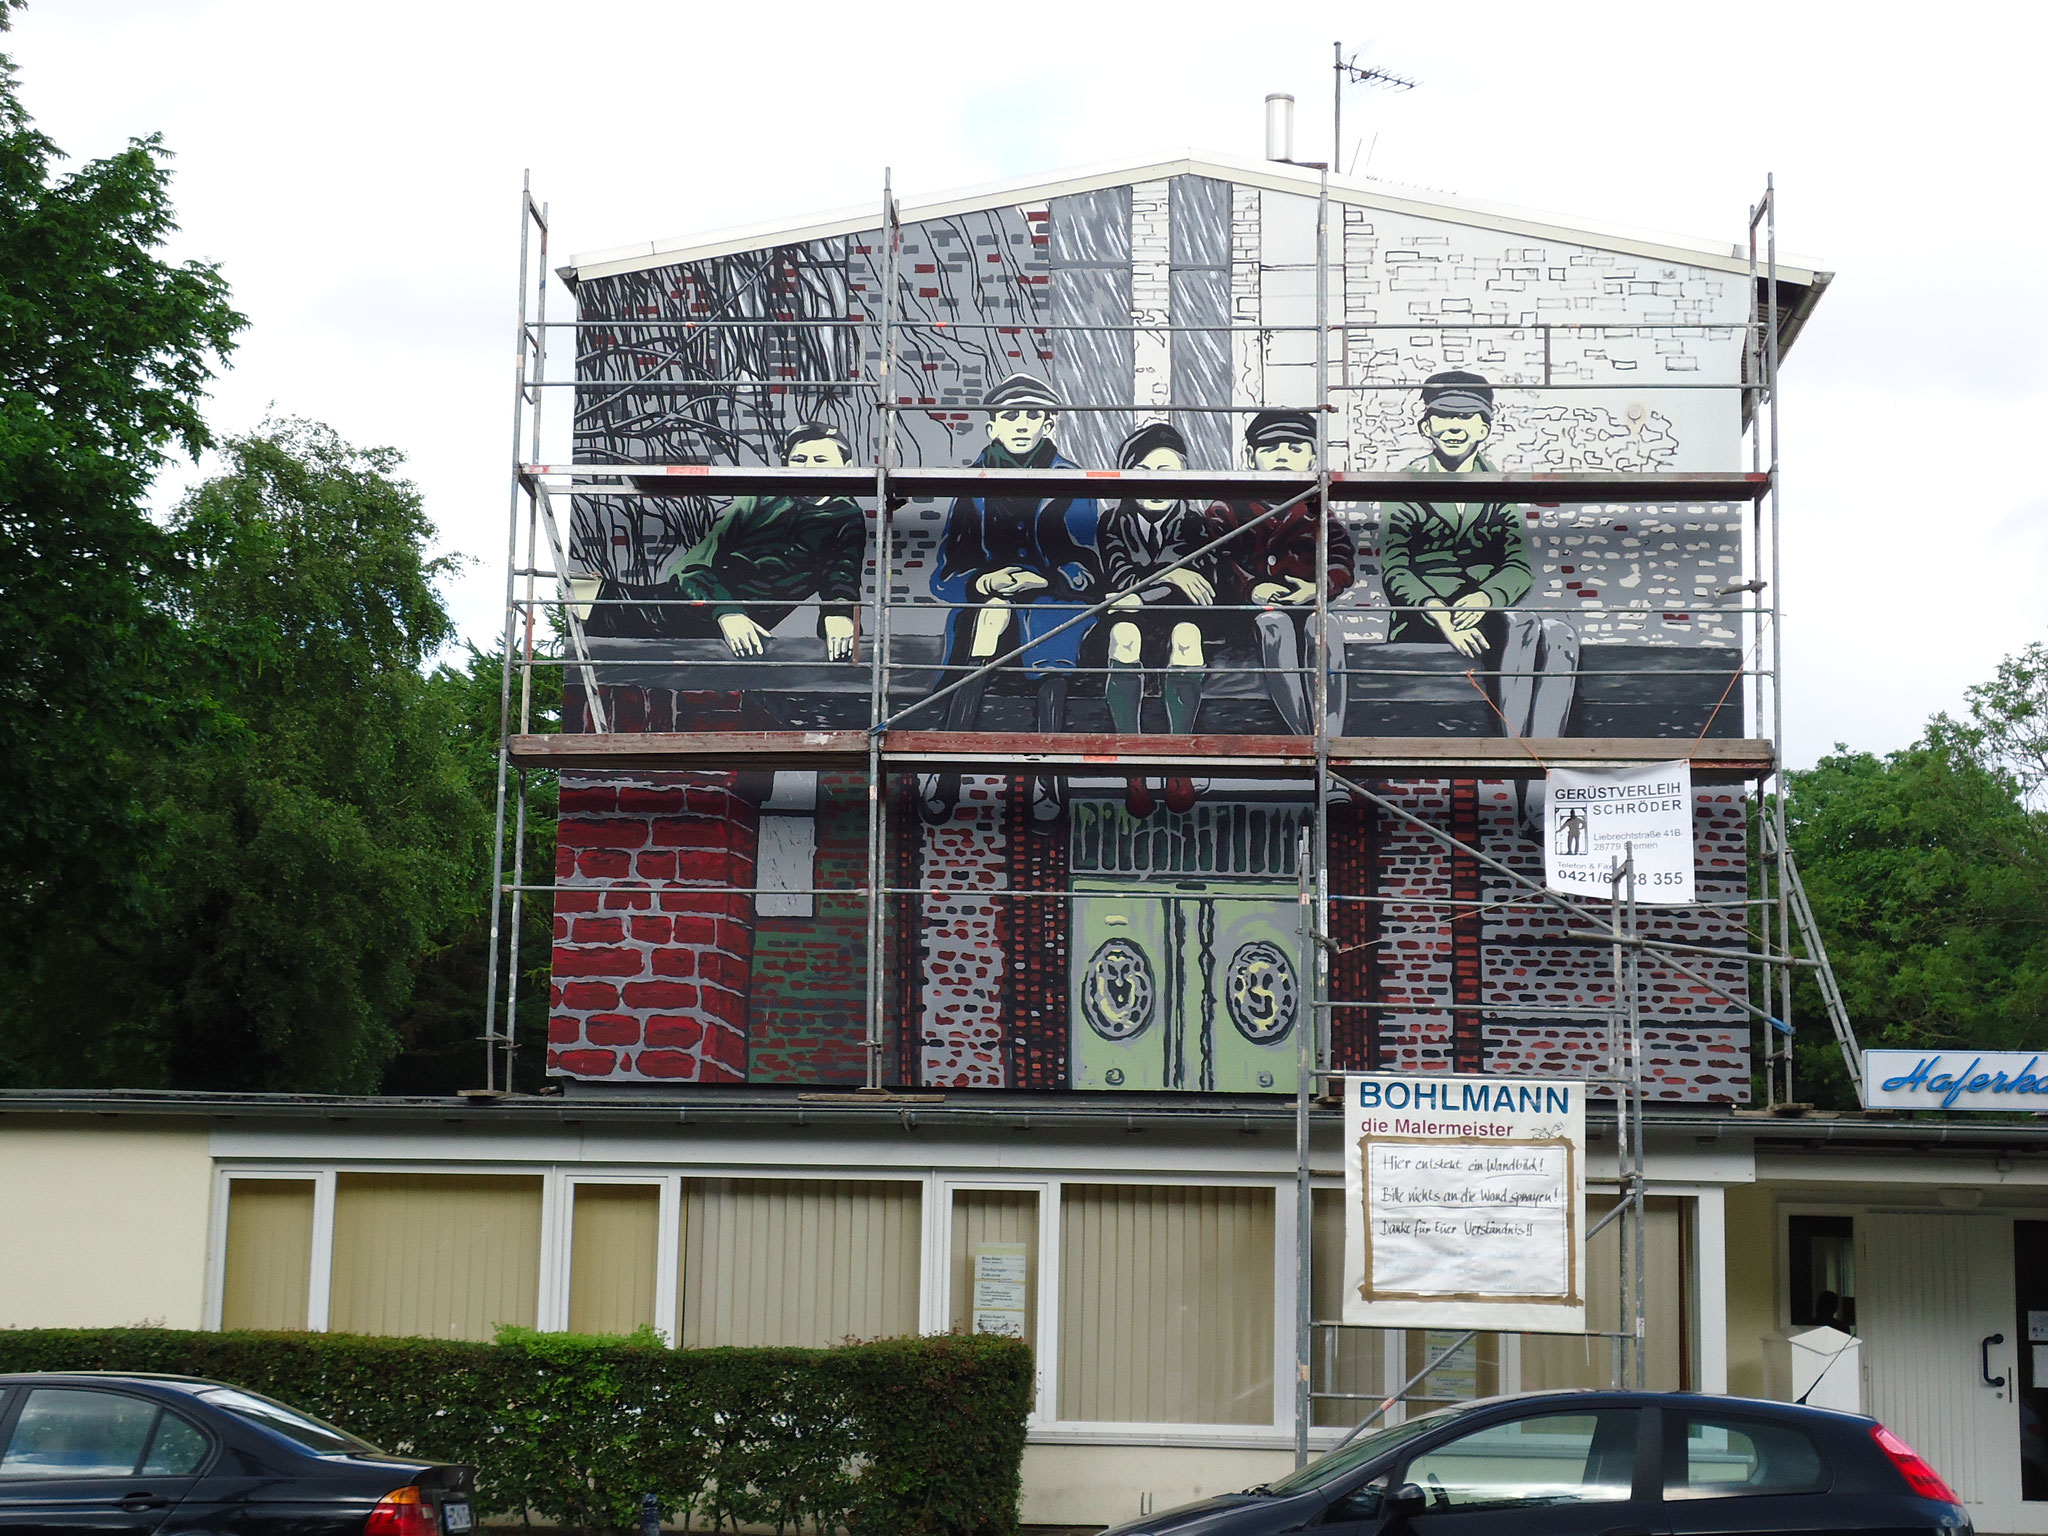 Fassadenmalerei 2012, Begegnungsstätte Haferkamp, Bremen/Walle